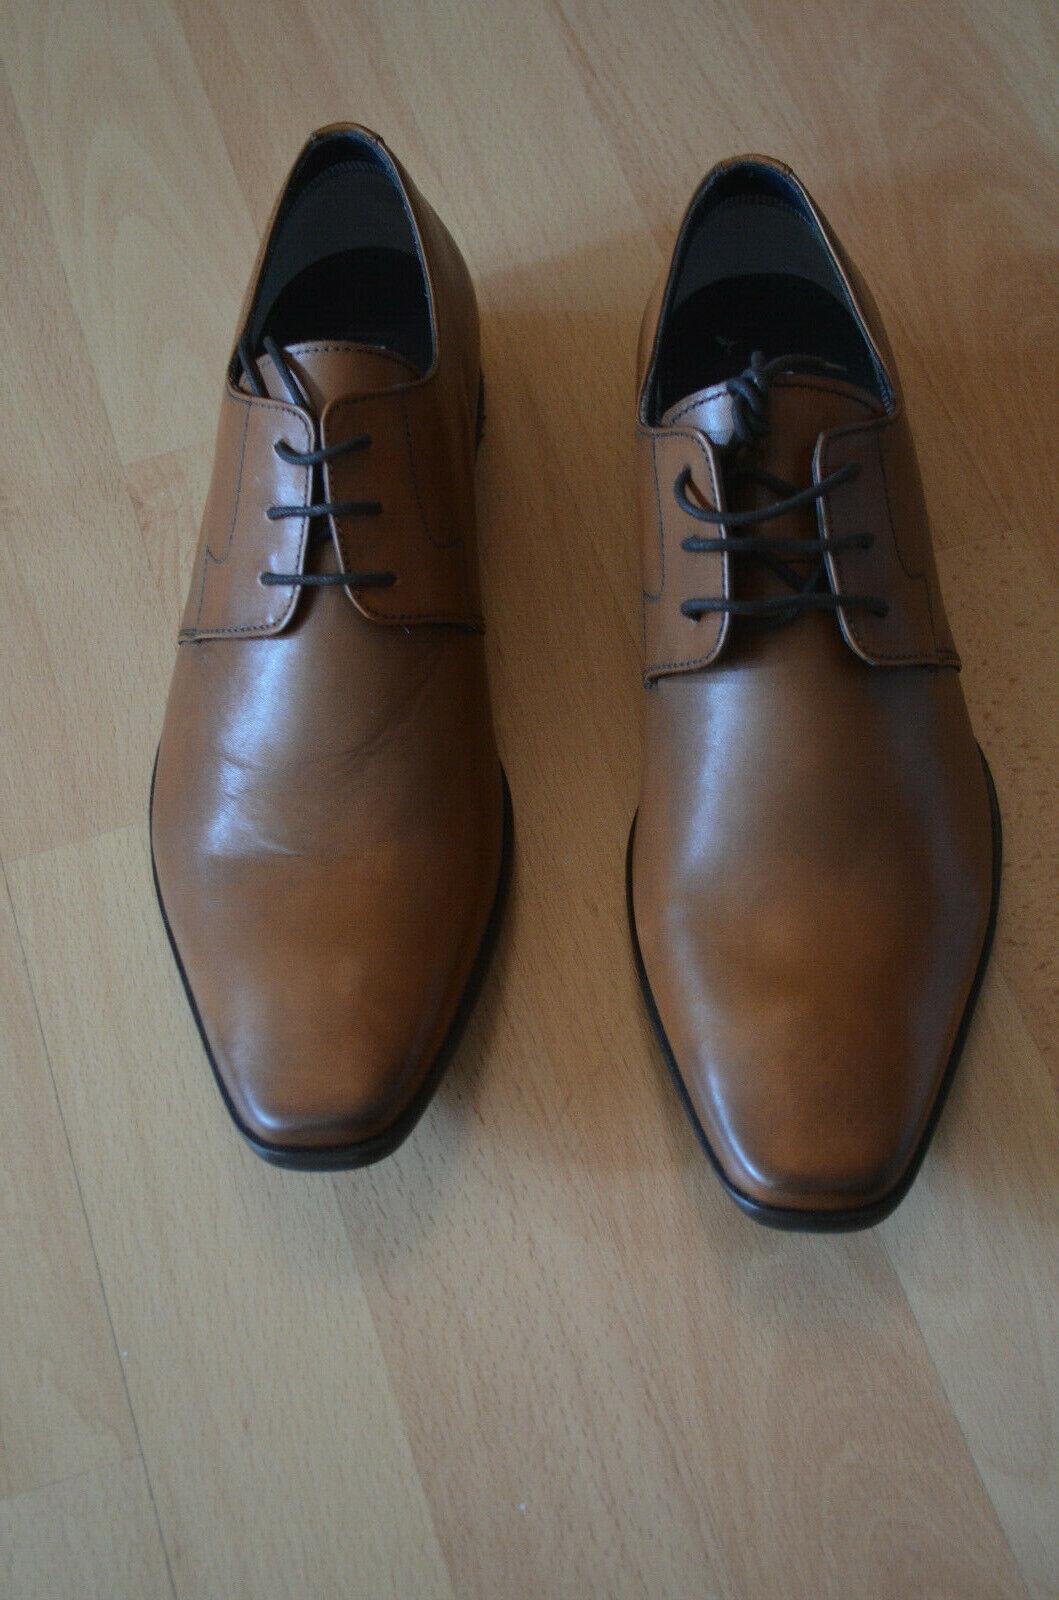 ADIDAS NEO M Daily Team Sneaker AW4580 EUR 48 UK 12,5 Herren Schuhe schwarz Men